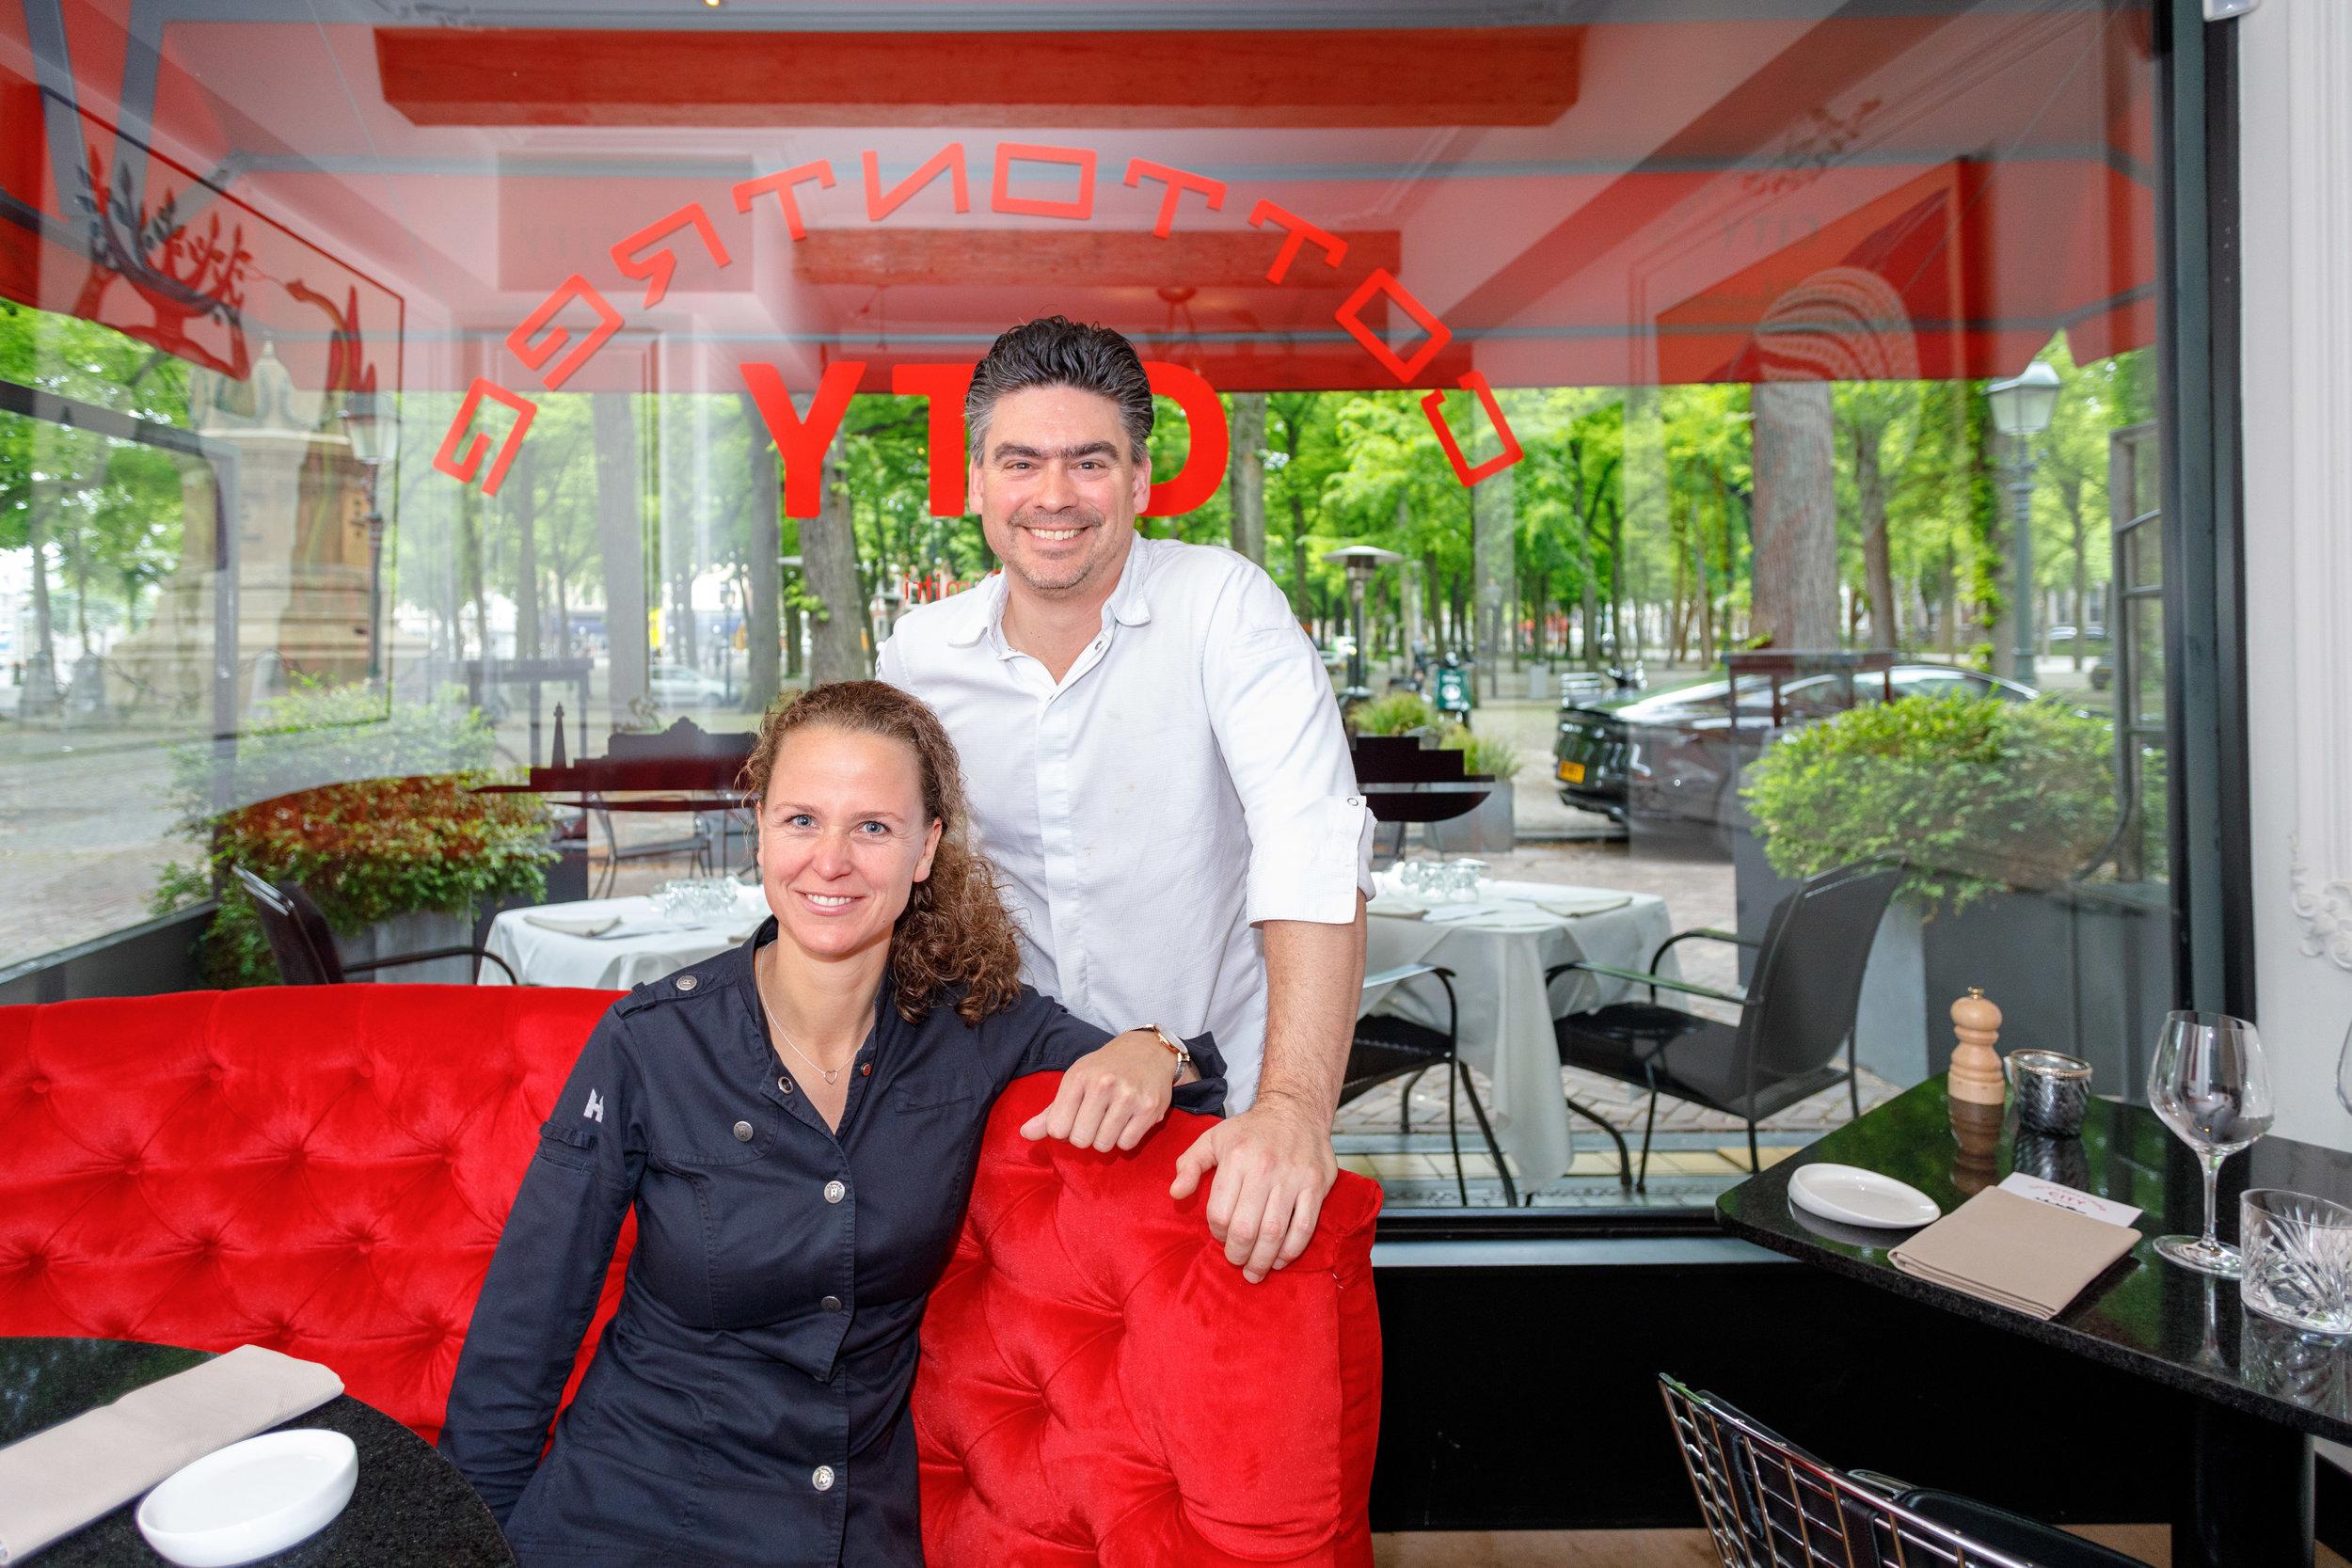 Manon & Dimitri Heinrichs | Cottontry City